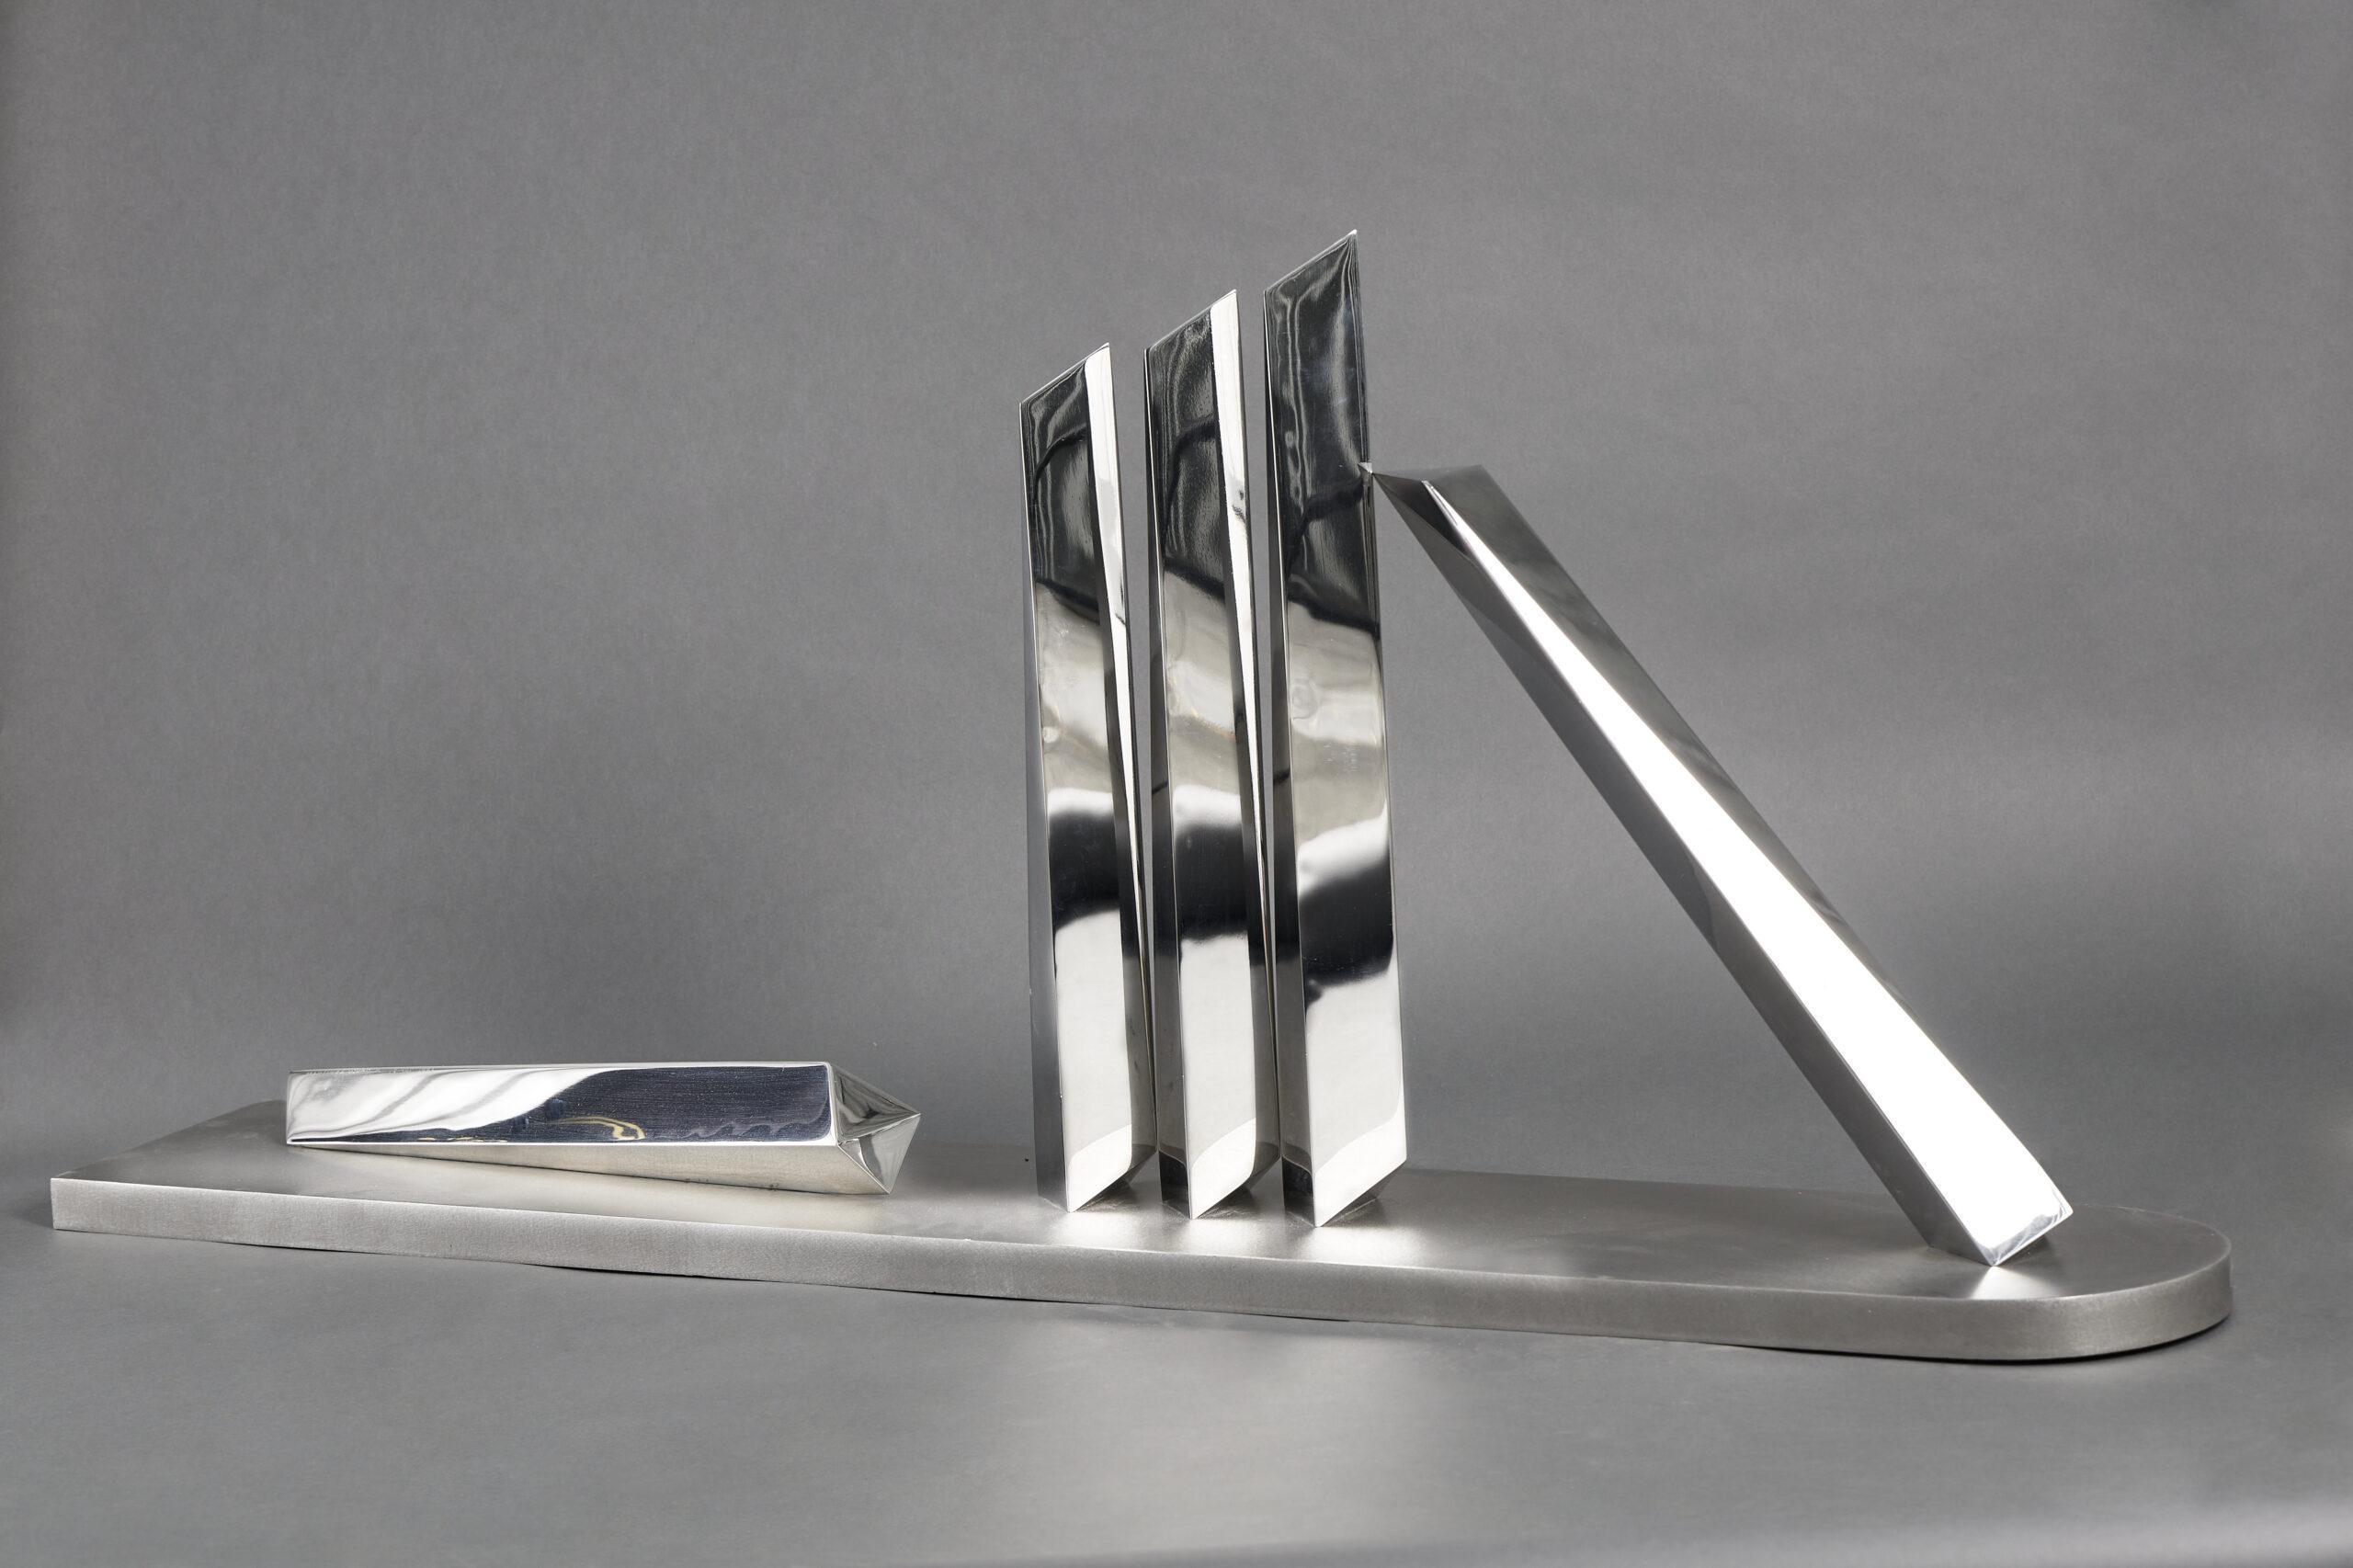 Lote 035 – Vestigio Geométrico del presente – Aço